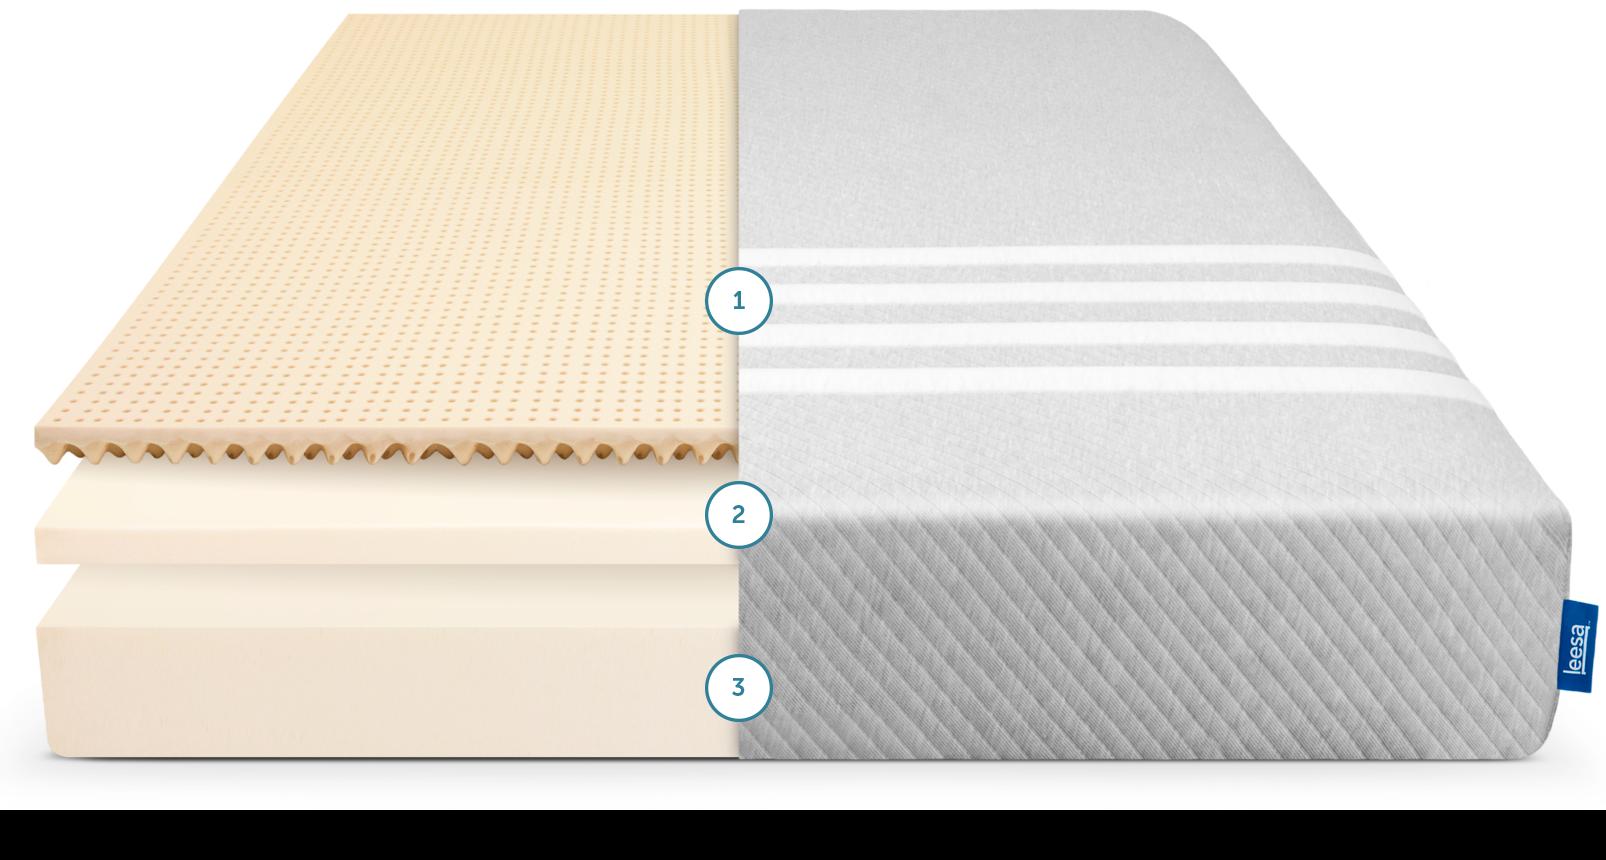 Memory Foam Mattress Cooling Supportive Comfortable Leesa Leesa Mattress Mattress Memory Foam Mattress